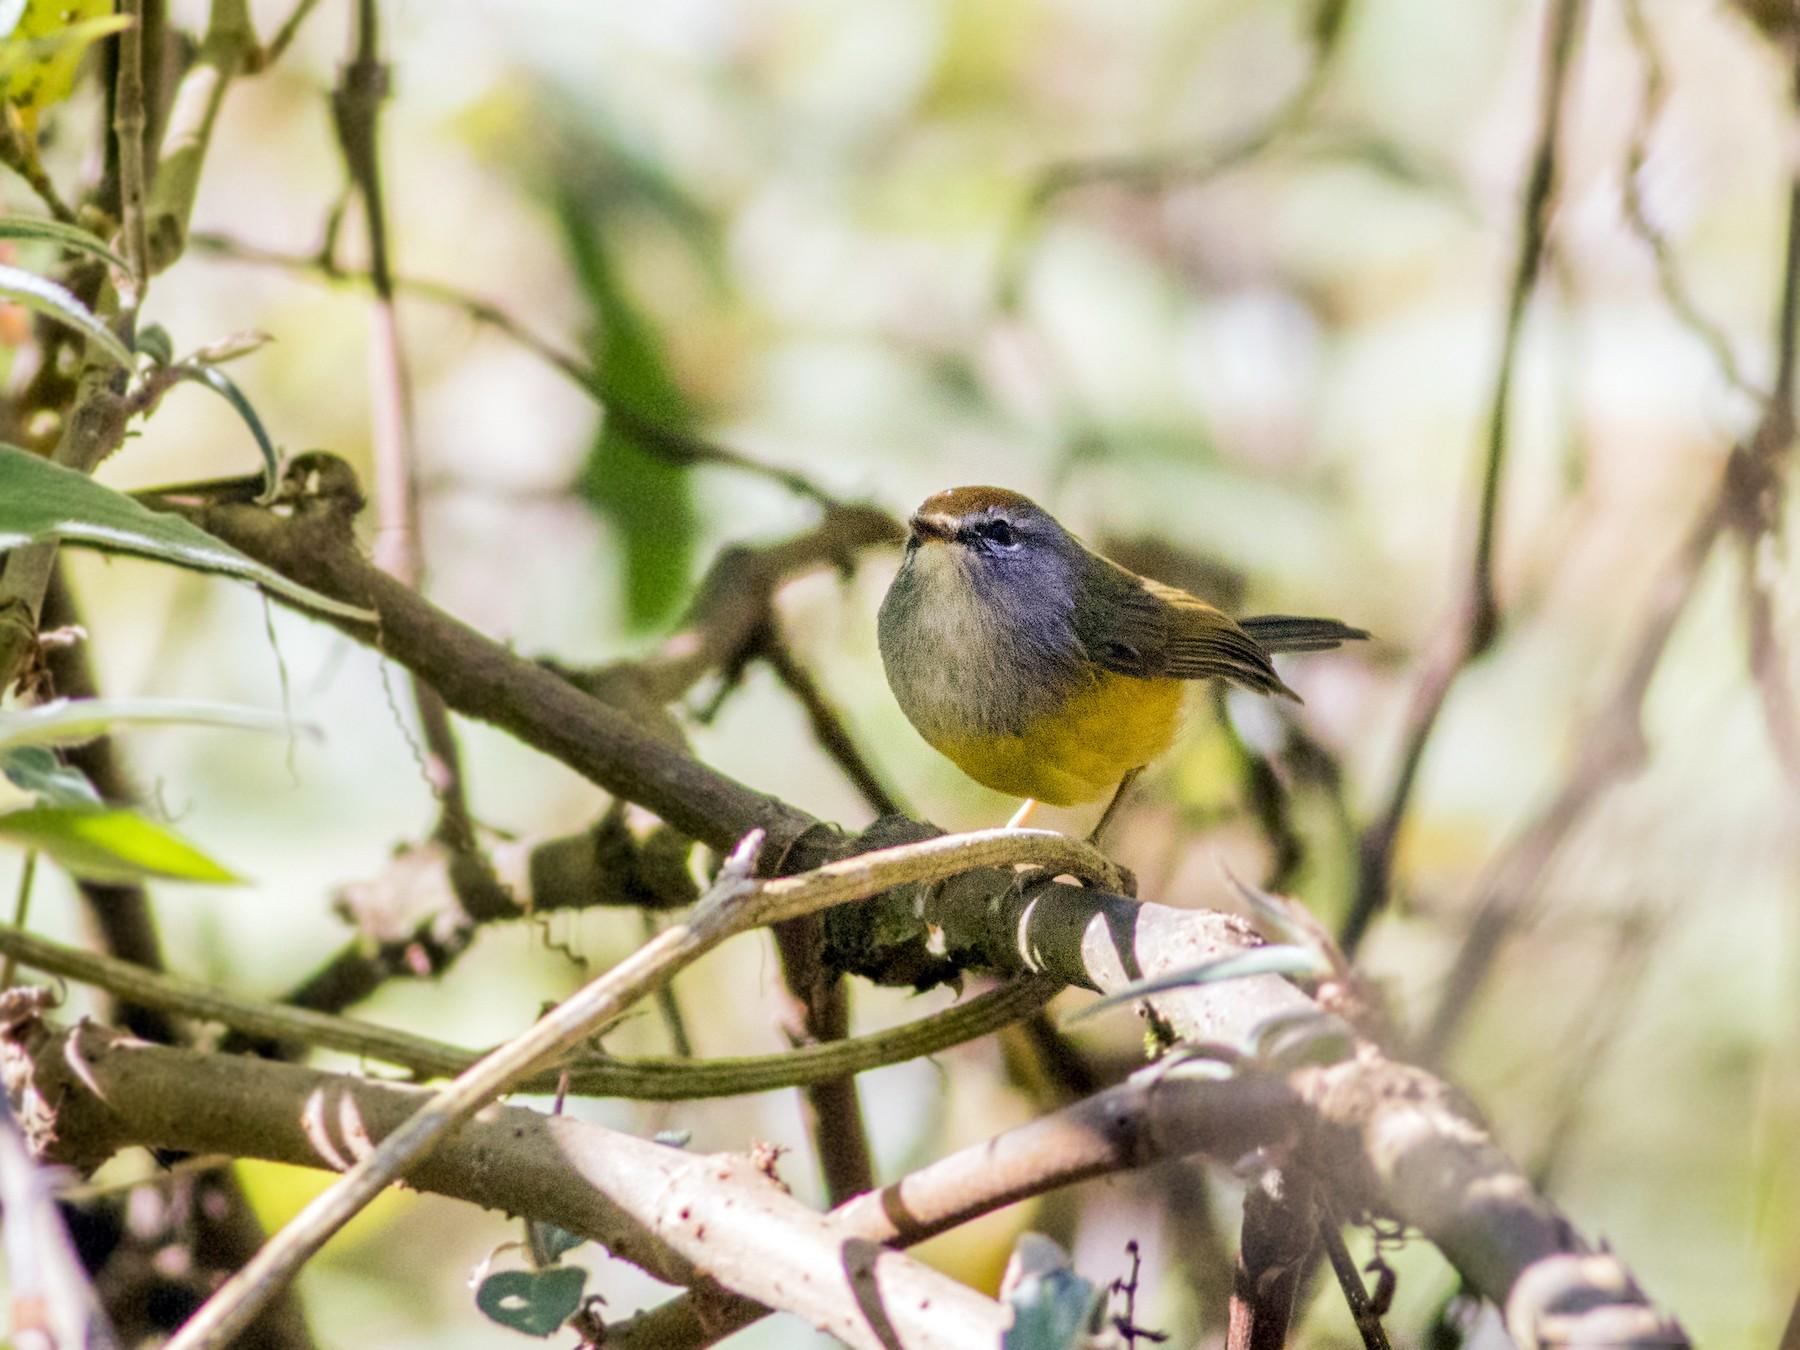 Broad-billed Warbler - Rajdeep Mitra